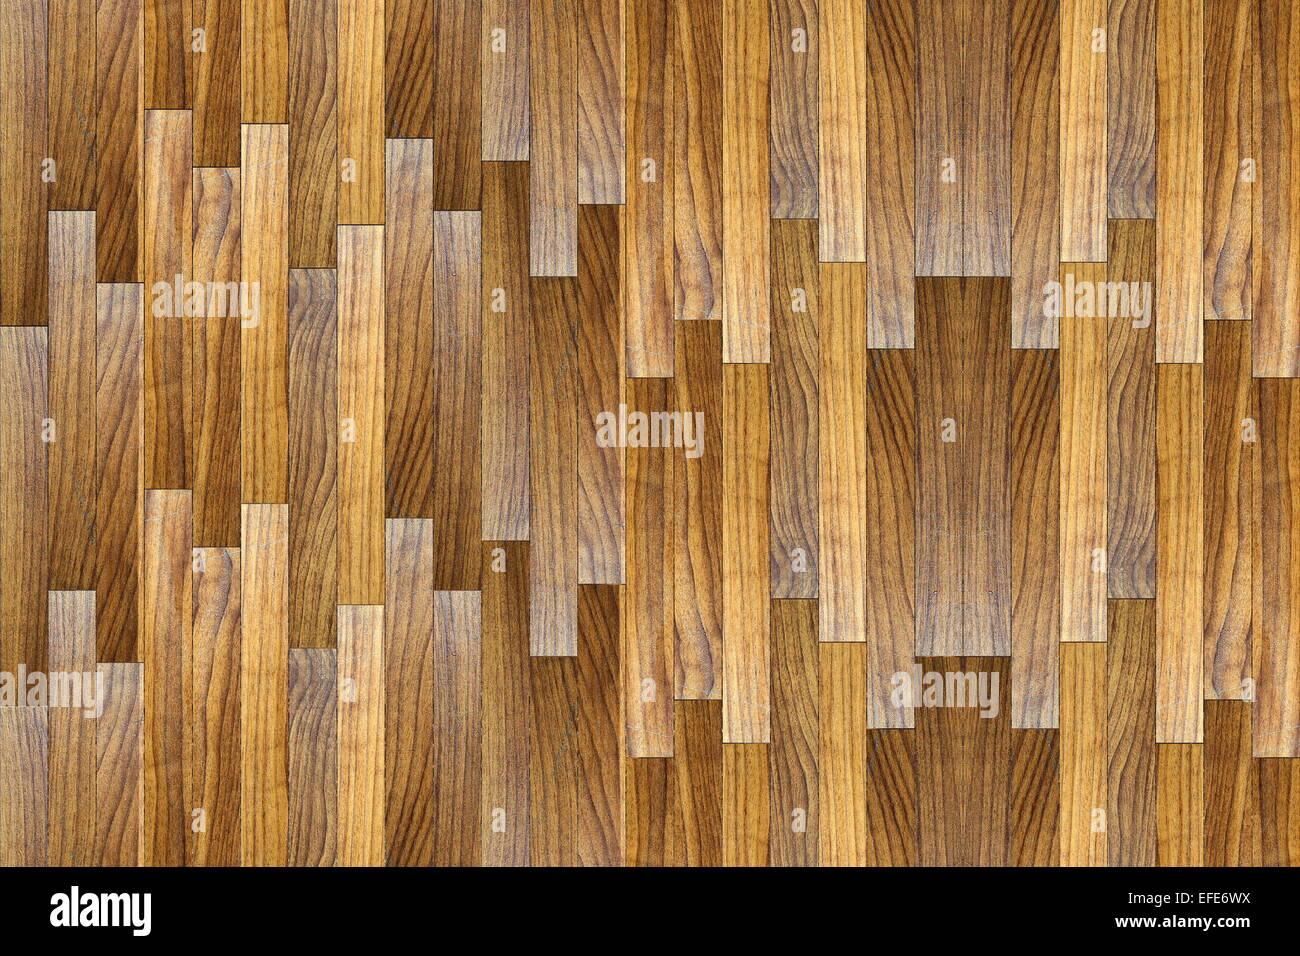 Wooden parquet tiles for floor design stock photo royalty free stock photo wooden parquet tiles for floor design dailygadgetfo Image collections